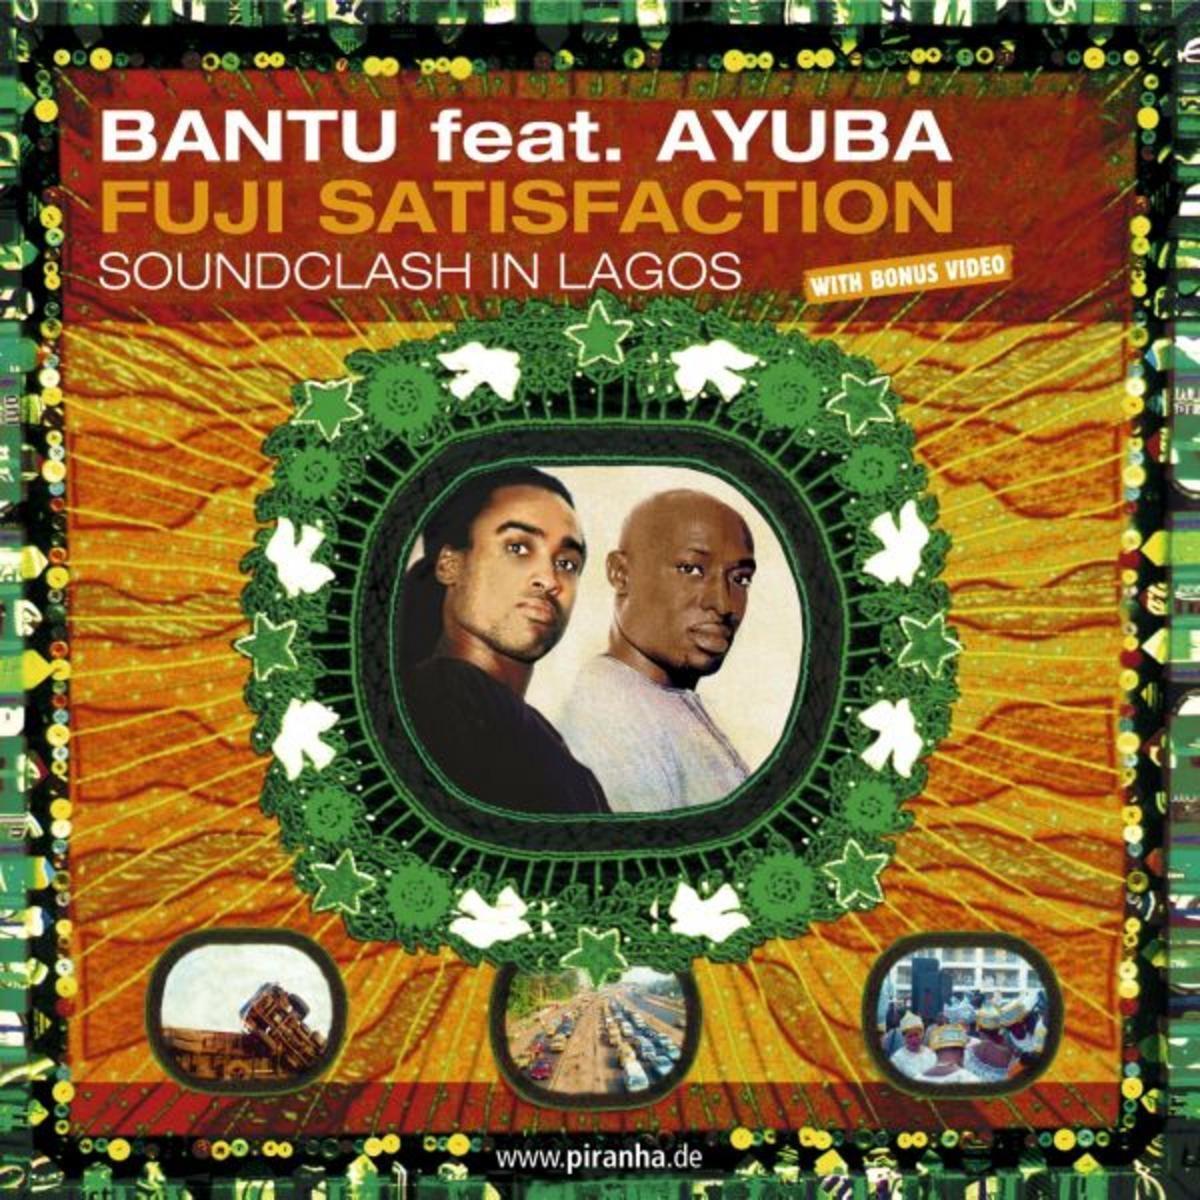 Adé Bantu Adewale Ayuba – Fuji satisfaction : NIGERIAN Folk Music ALBUM LP